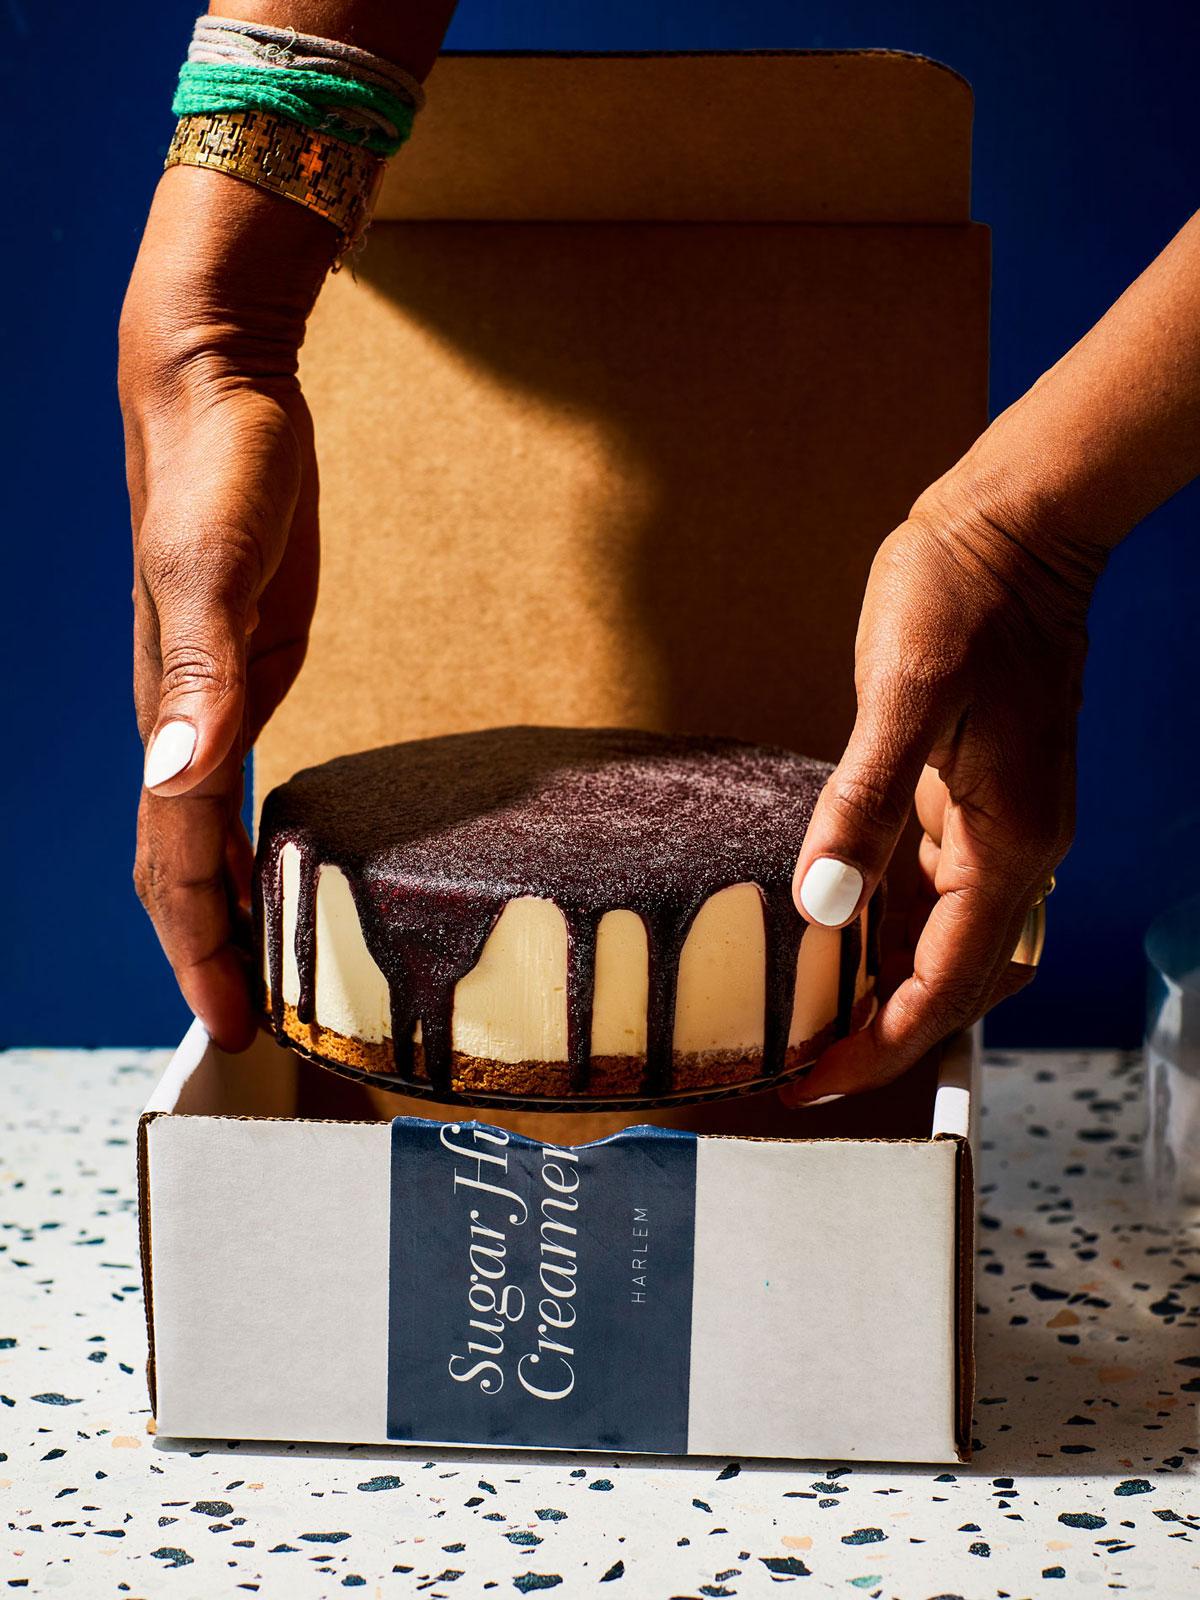 A person placing ice cream cake into a box.